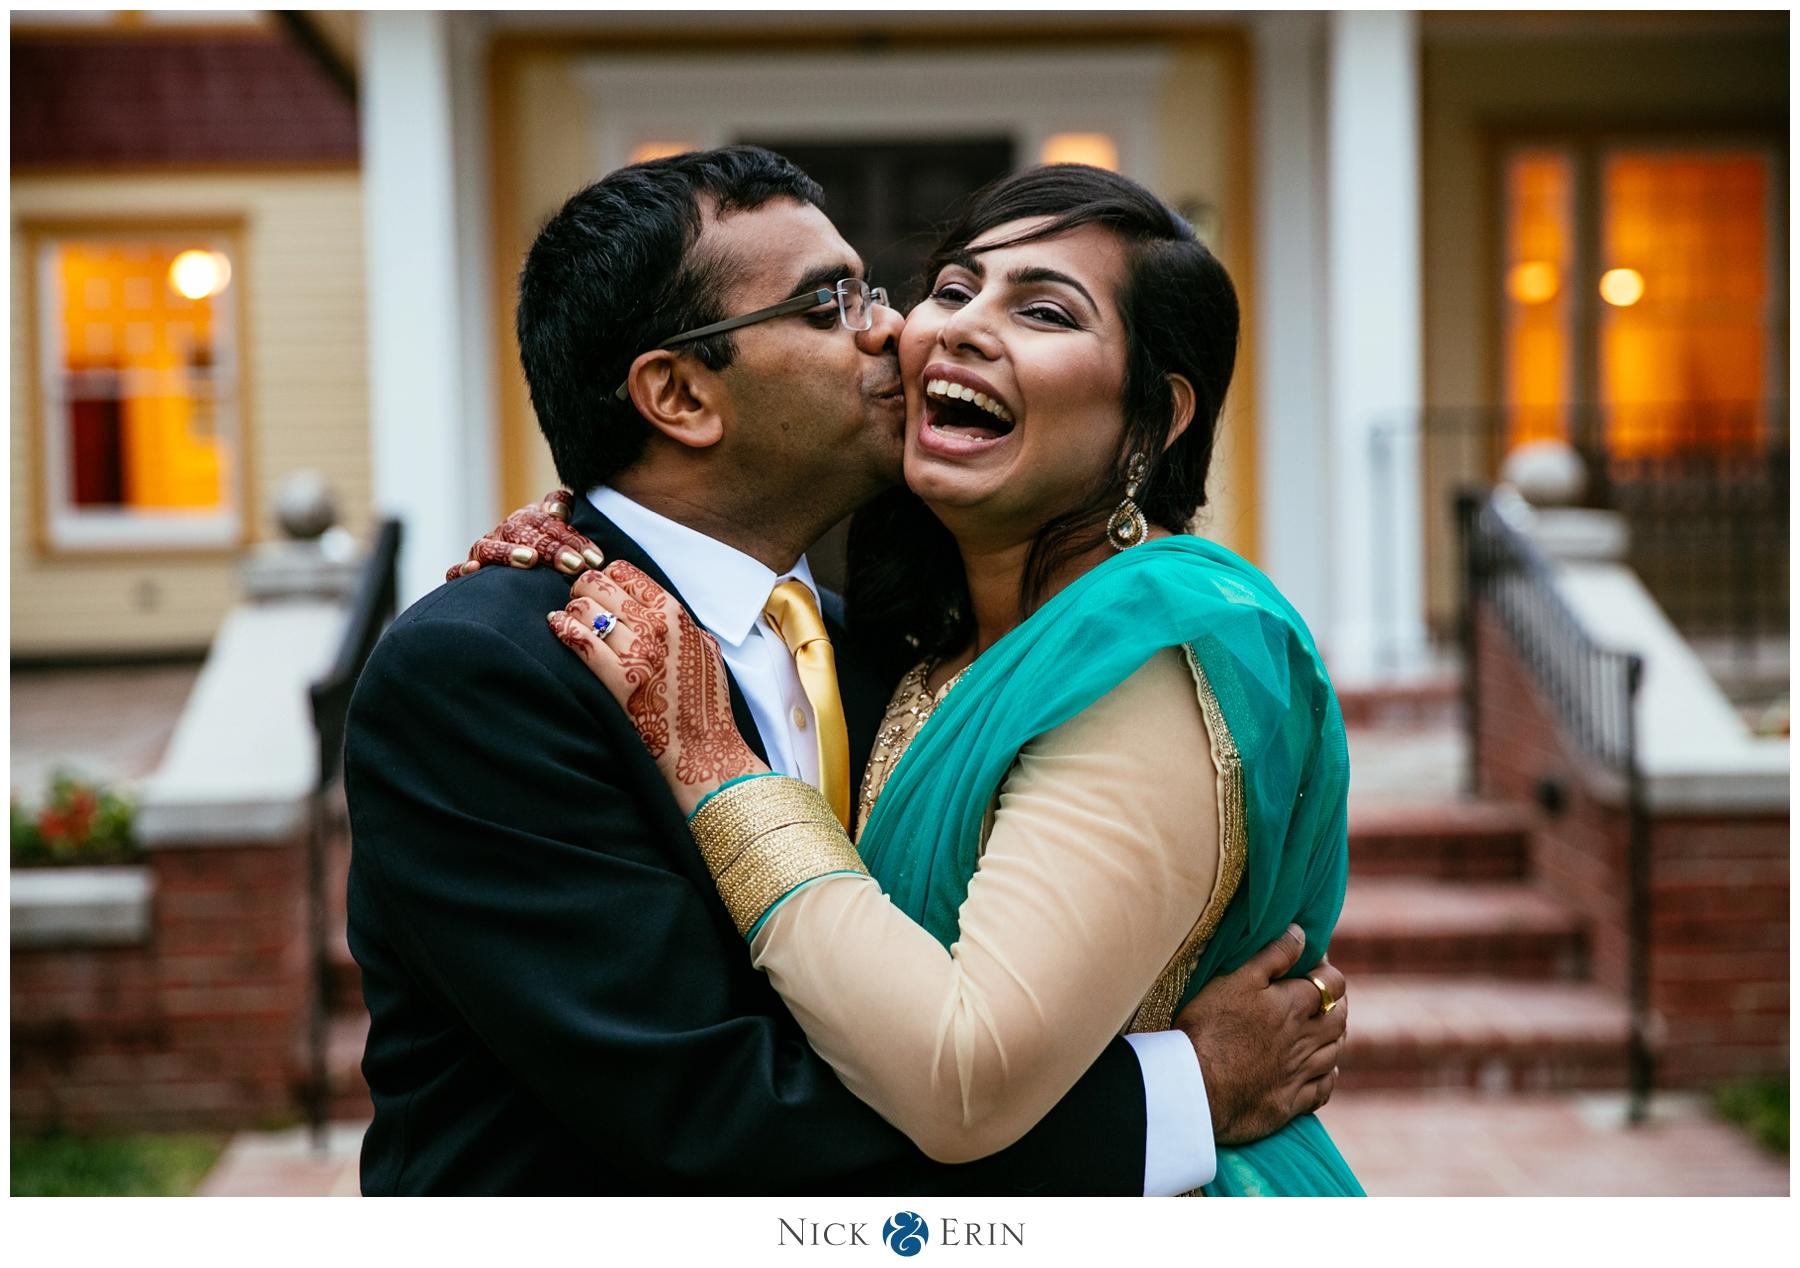 Donner_Photography_Arlington VA Wedding_Amrith and Aleefia_0012